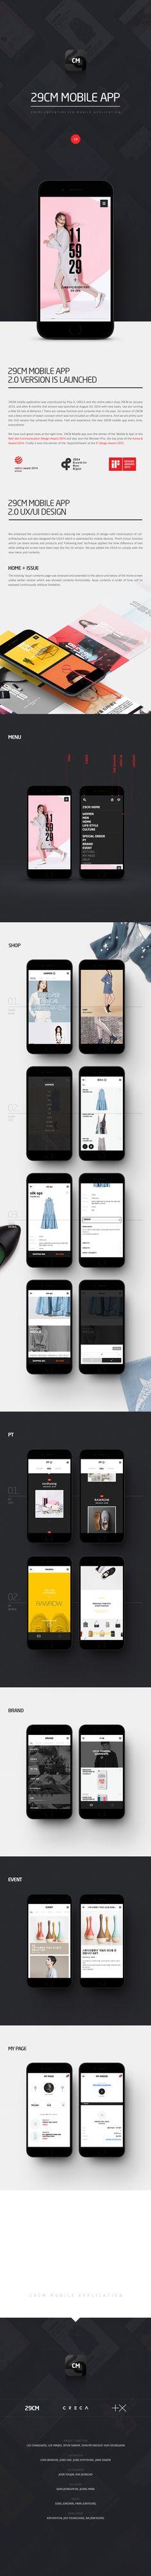 29CM Mobile E-Commerce Fashion App UI Design /// Designed by PlusX  /// PlusX Website_ http://www.plus-ex.com/ Brand Xperience Designer Blog_http://www.shind.me/